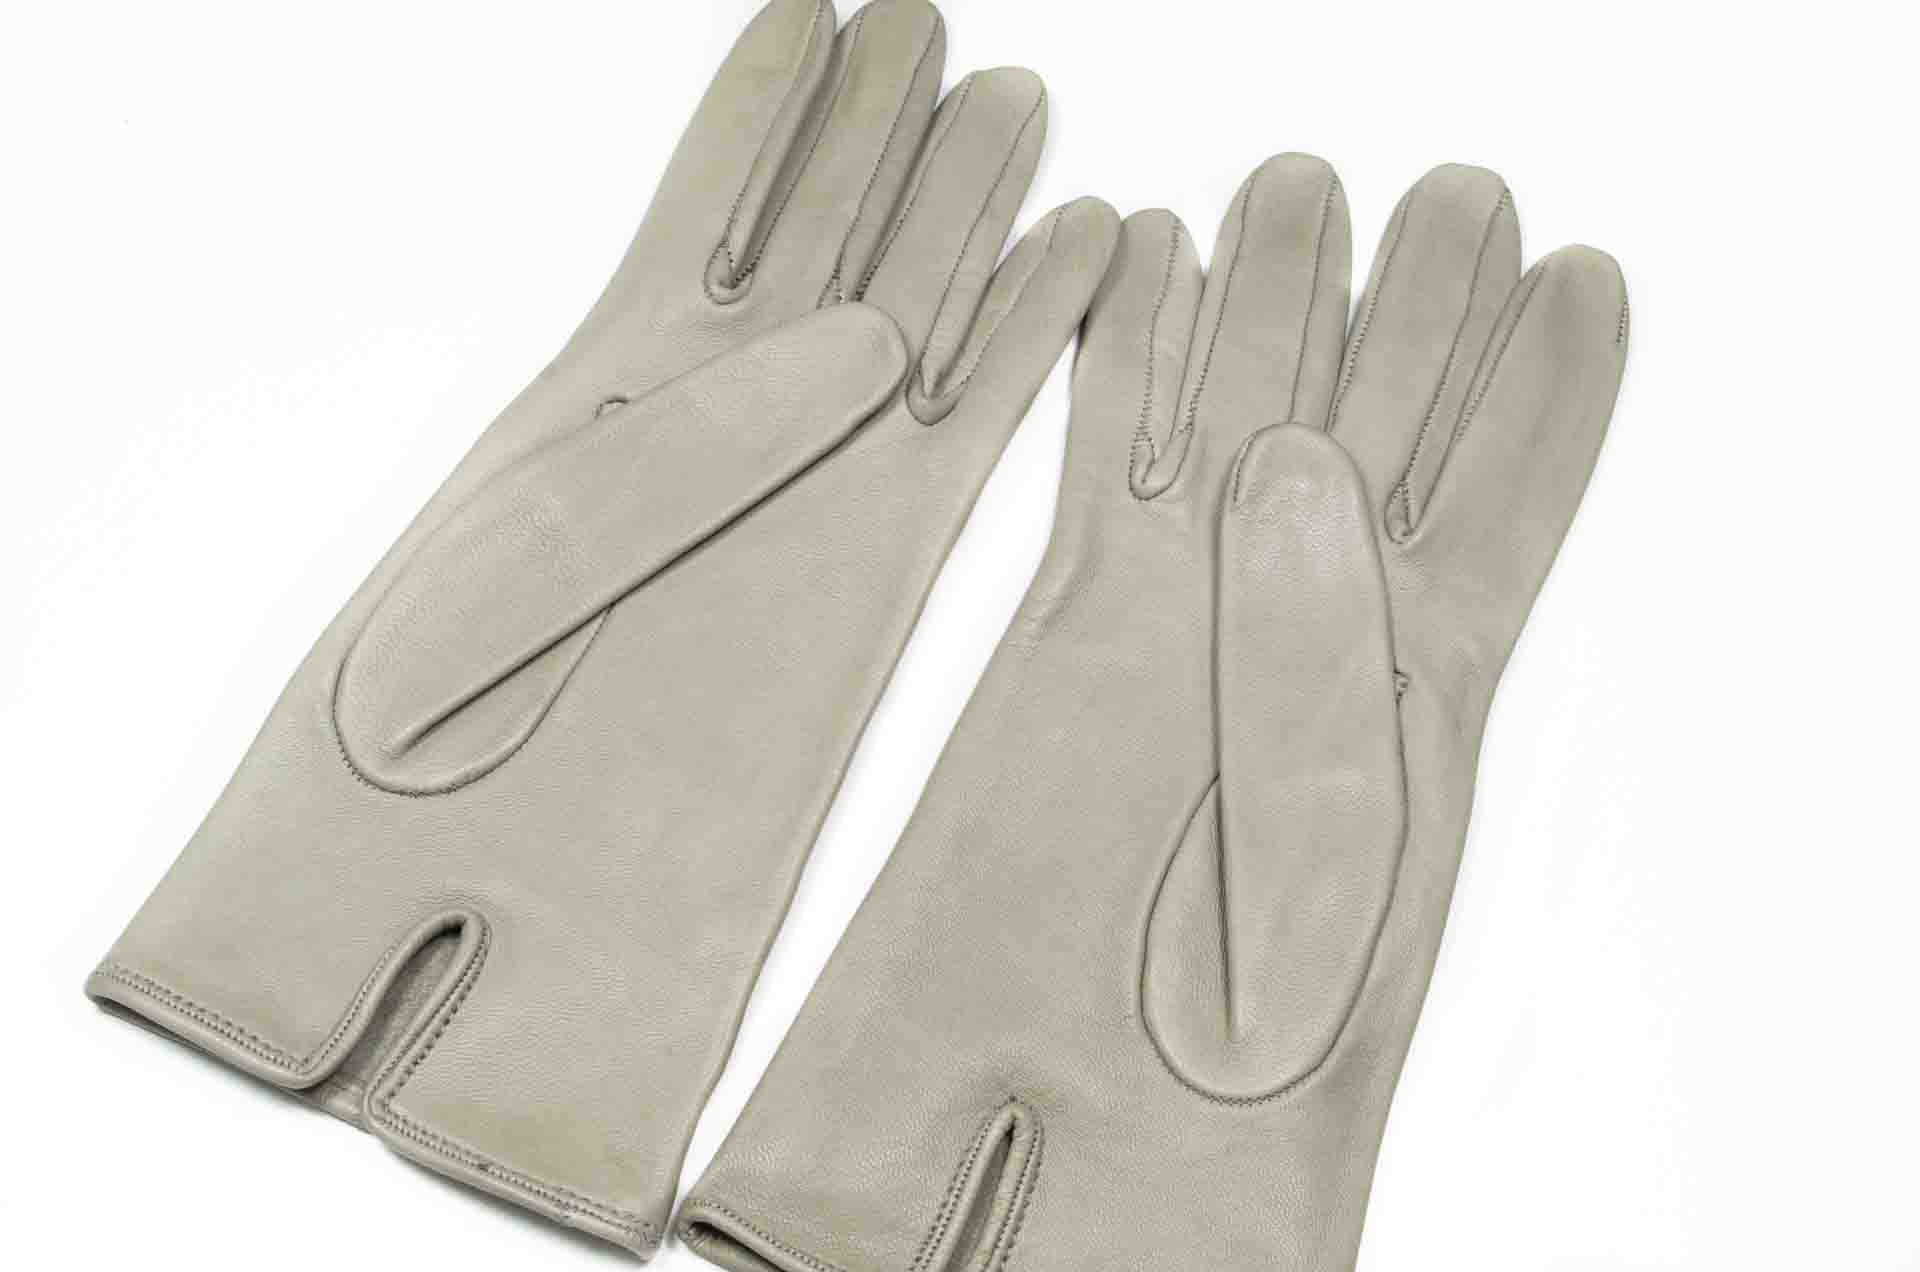 guanti in pelle grigi 2